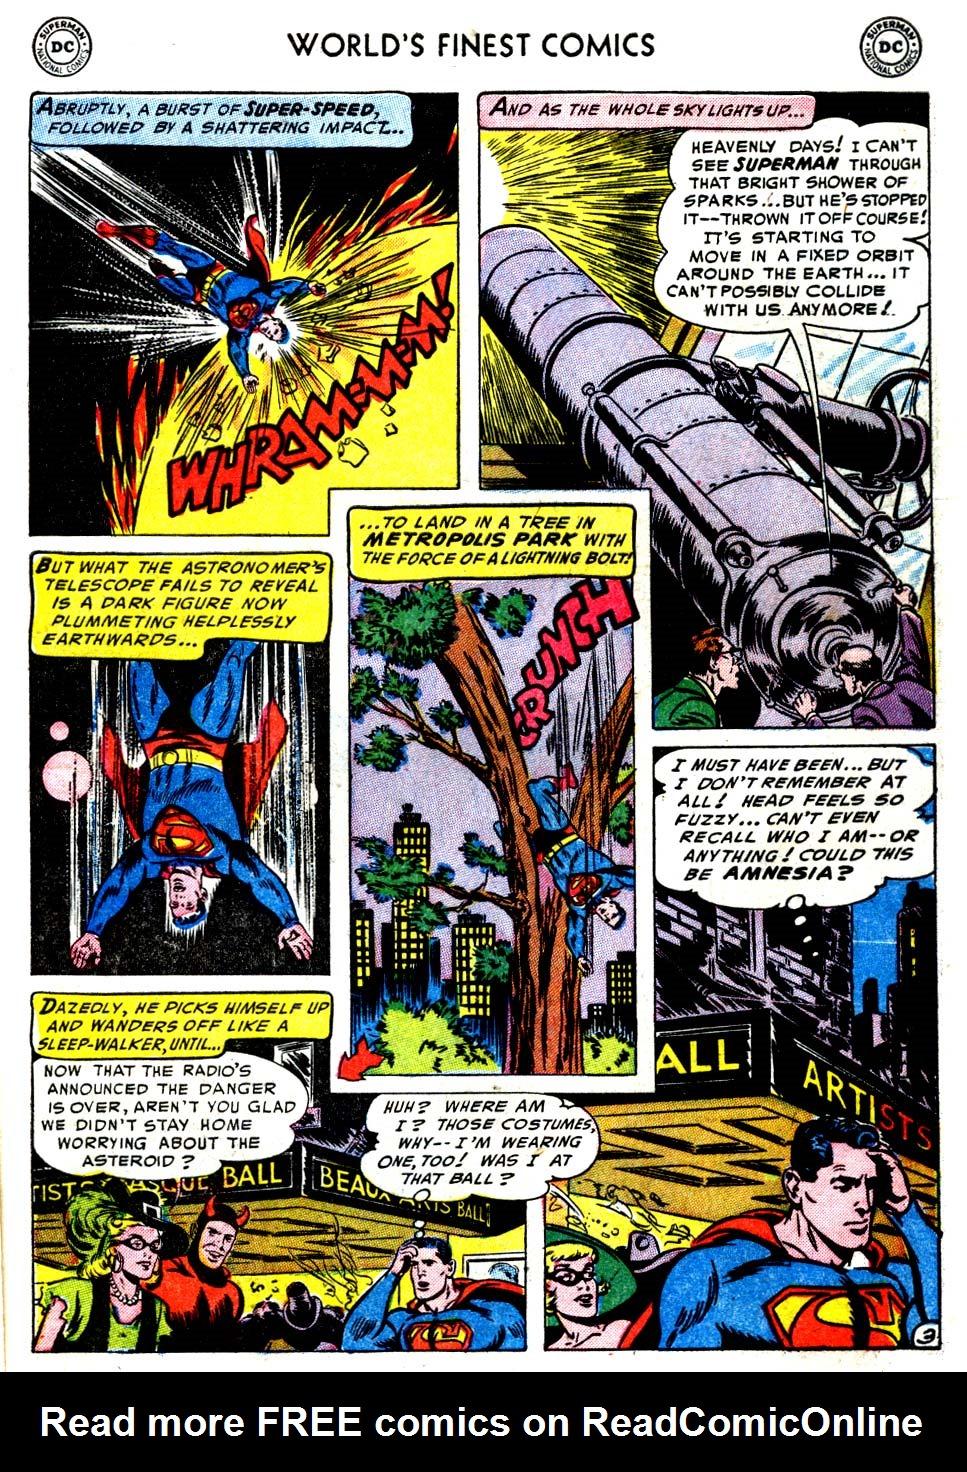 Read online World's Finest Comics comic -  Issue #68 - 5